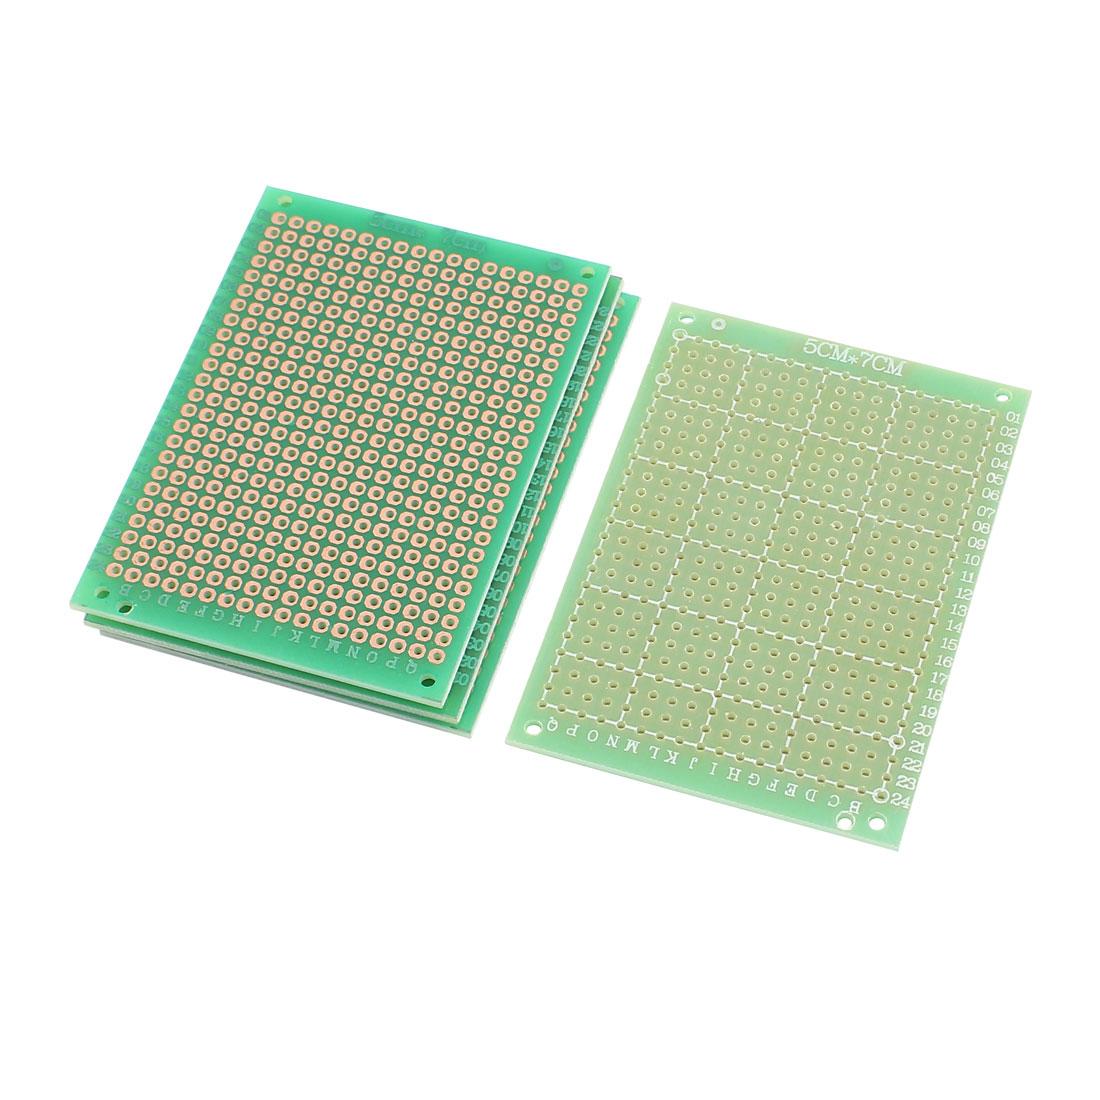 4pcs 5cm x 7cm Single Sided Universal DIY PCB Print Circuit Board Green